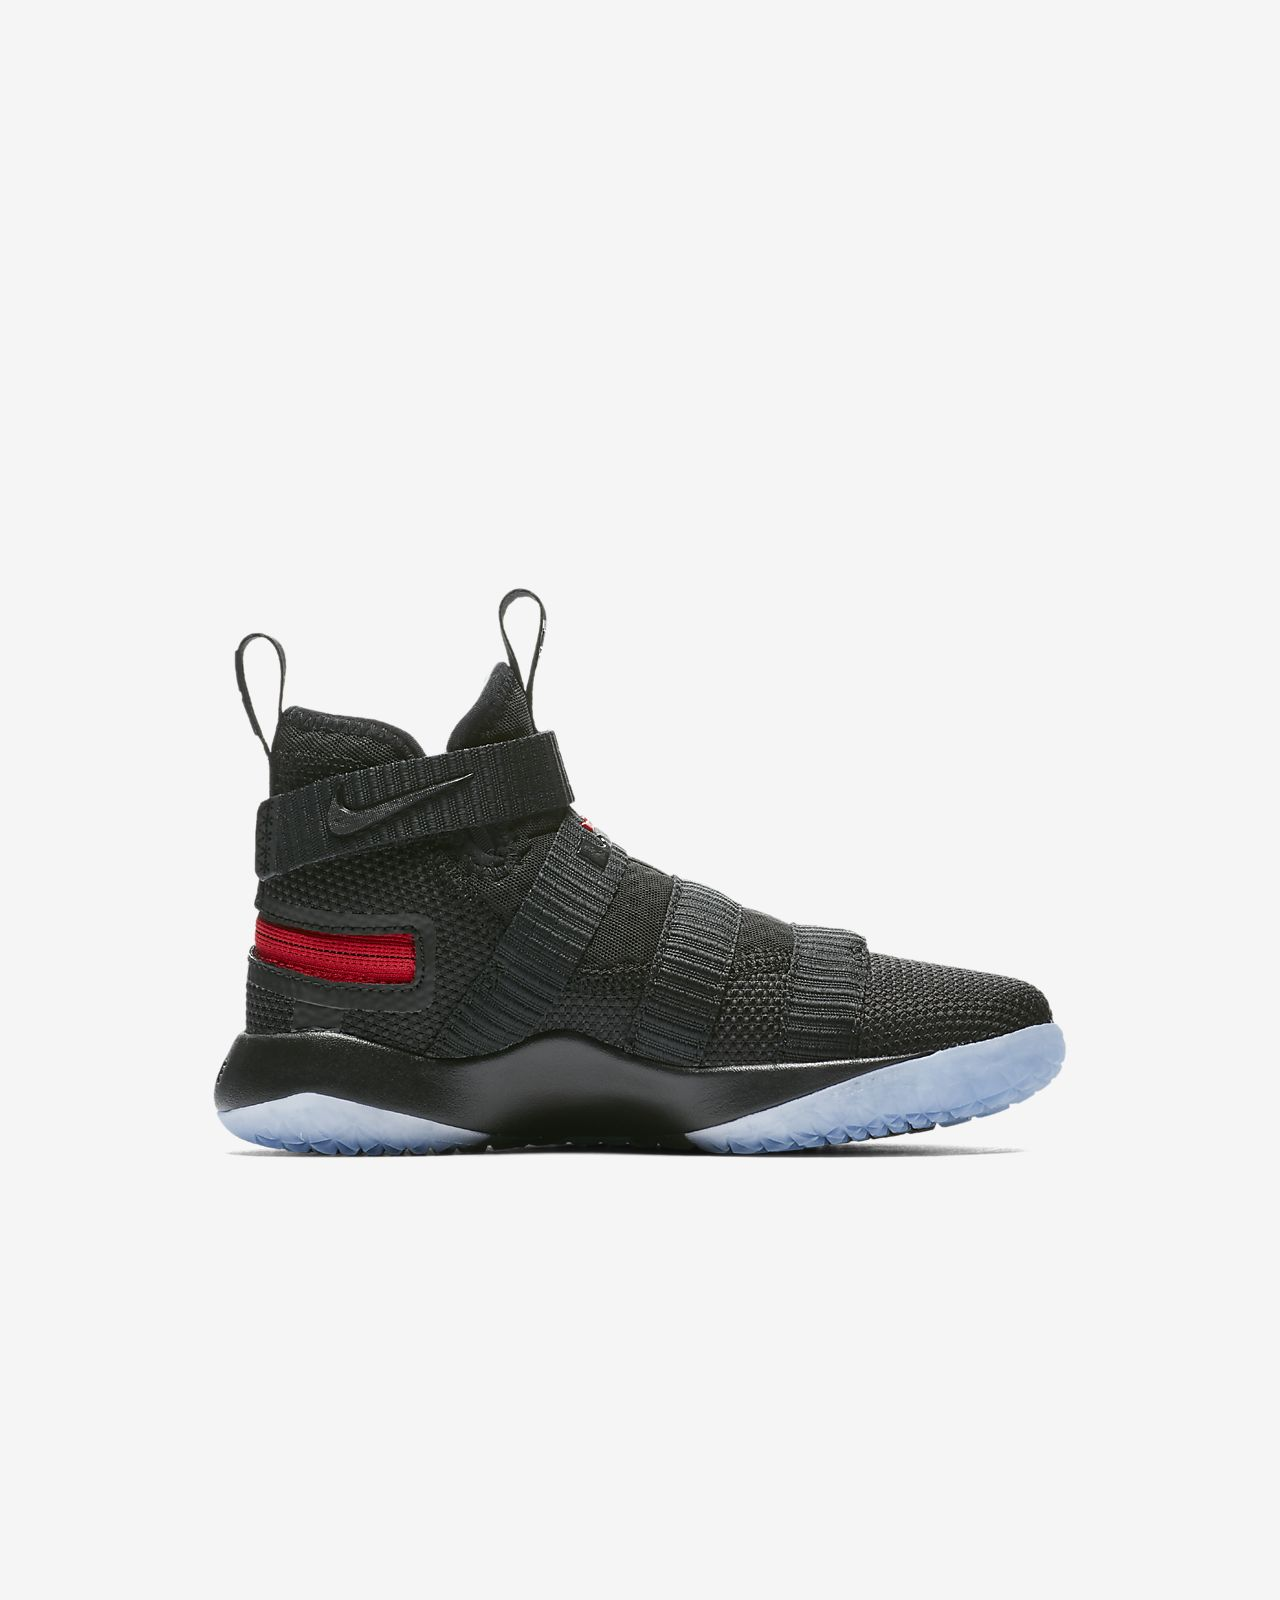 88d52b363a4e LeBron Soldier 11 FlyEase Little Kids  Shoe. Nike.com